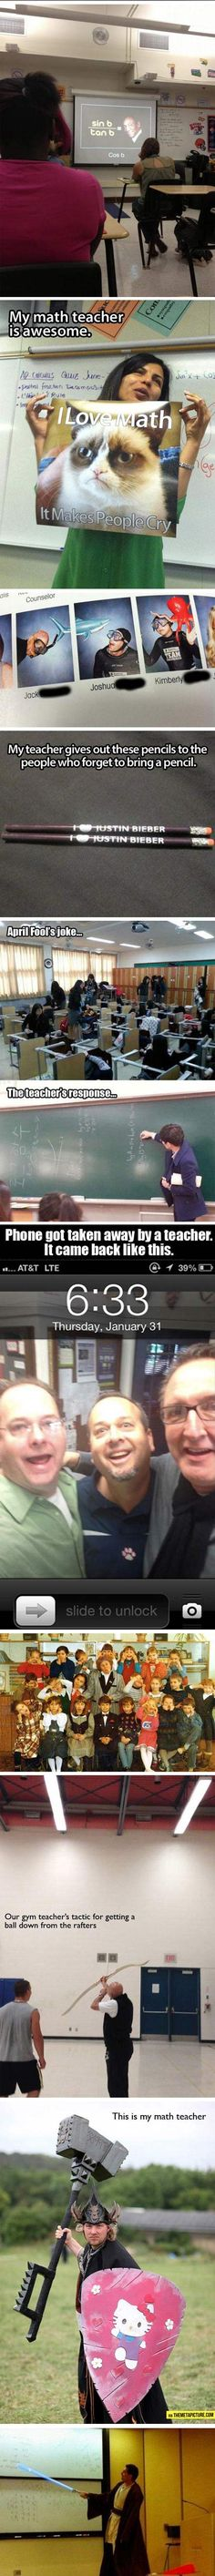 I feel like we need more teachers like this at the high school..